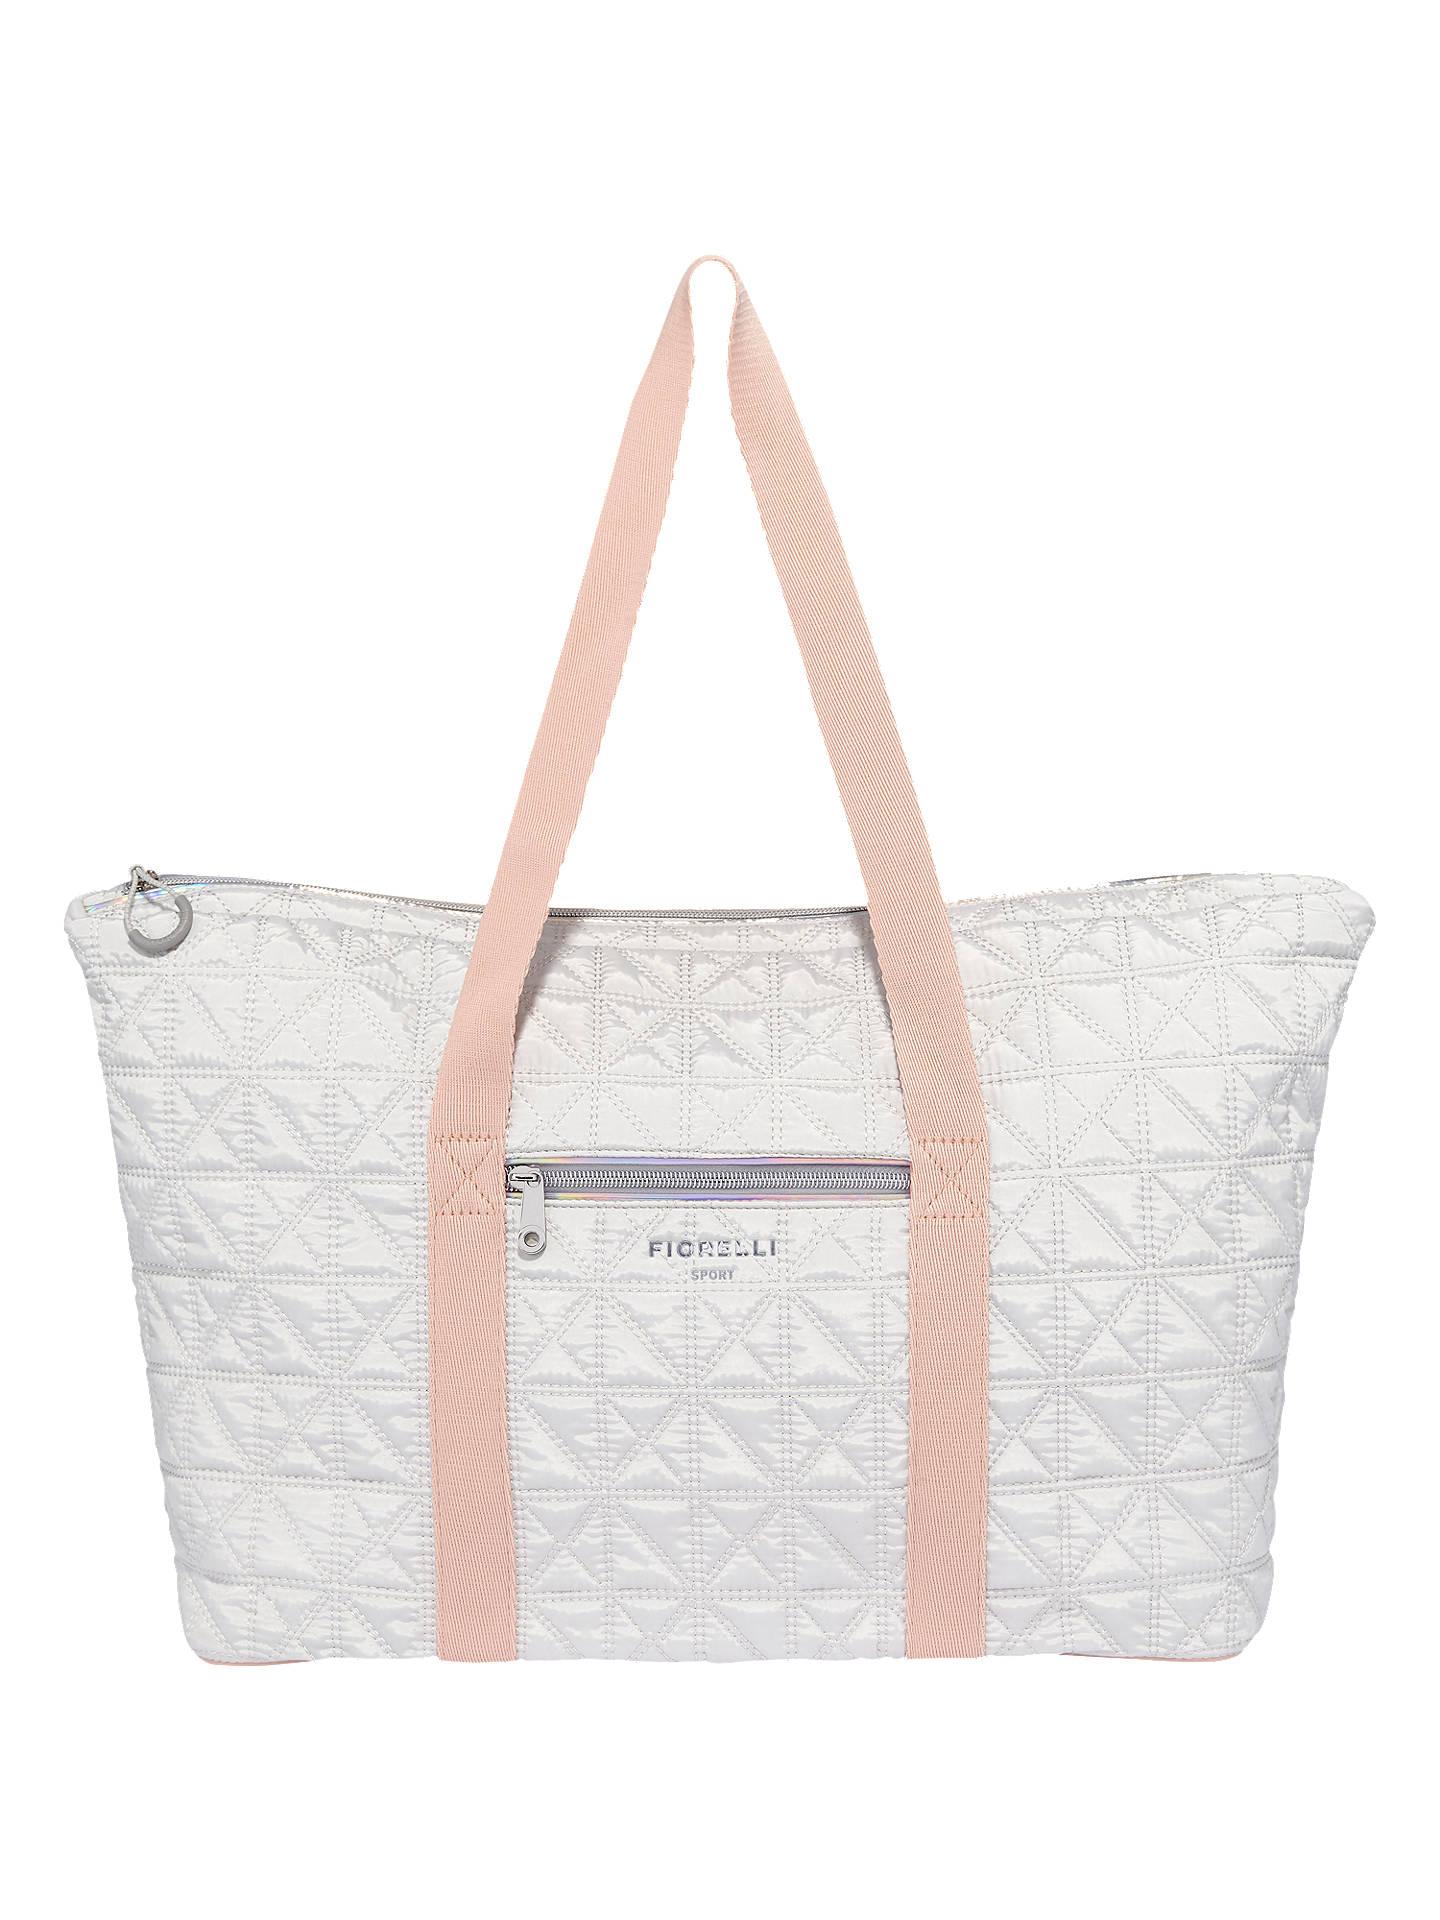 46460a1ce6 Buy Fiorelli Sport Fierce Shoulder Bag